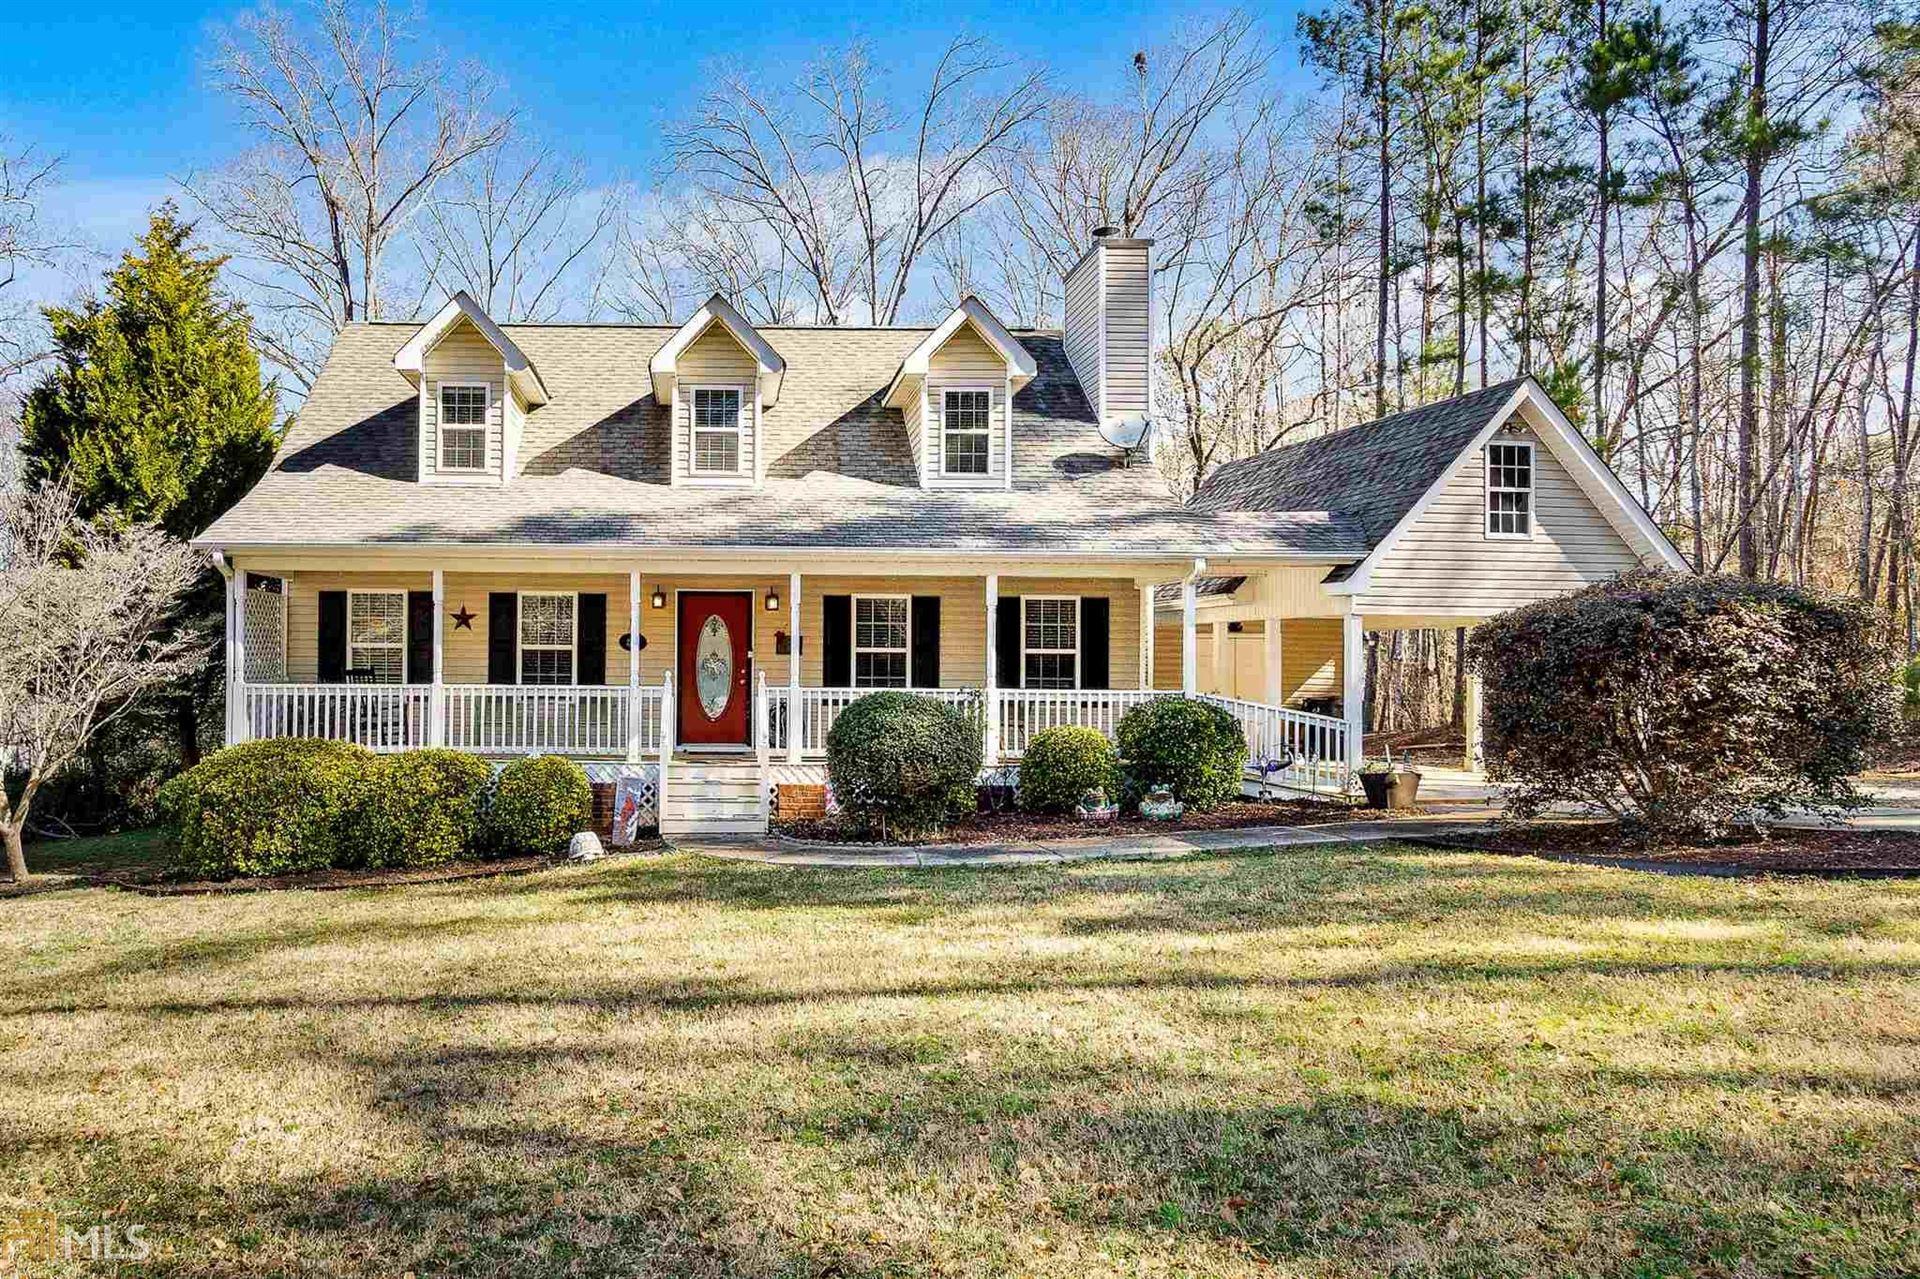 561 Raven Rd, Monticello, GA 31064 - MLS#: 8933579